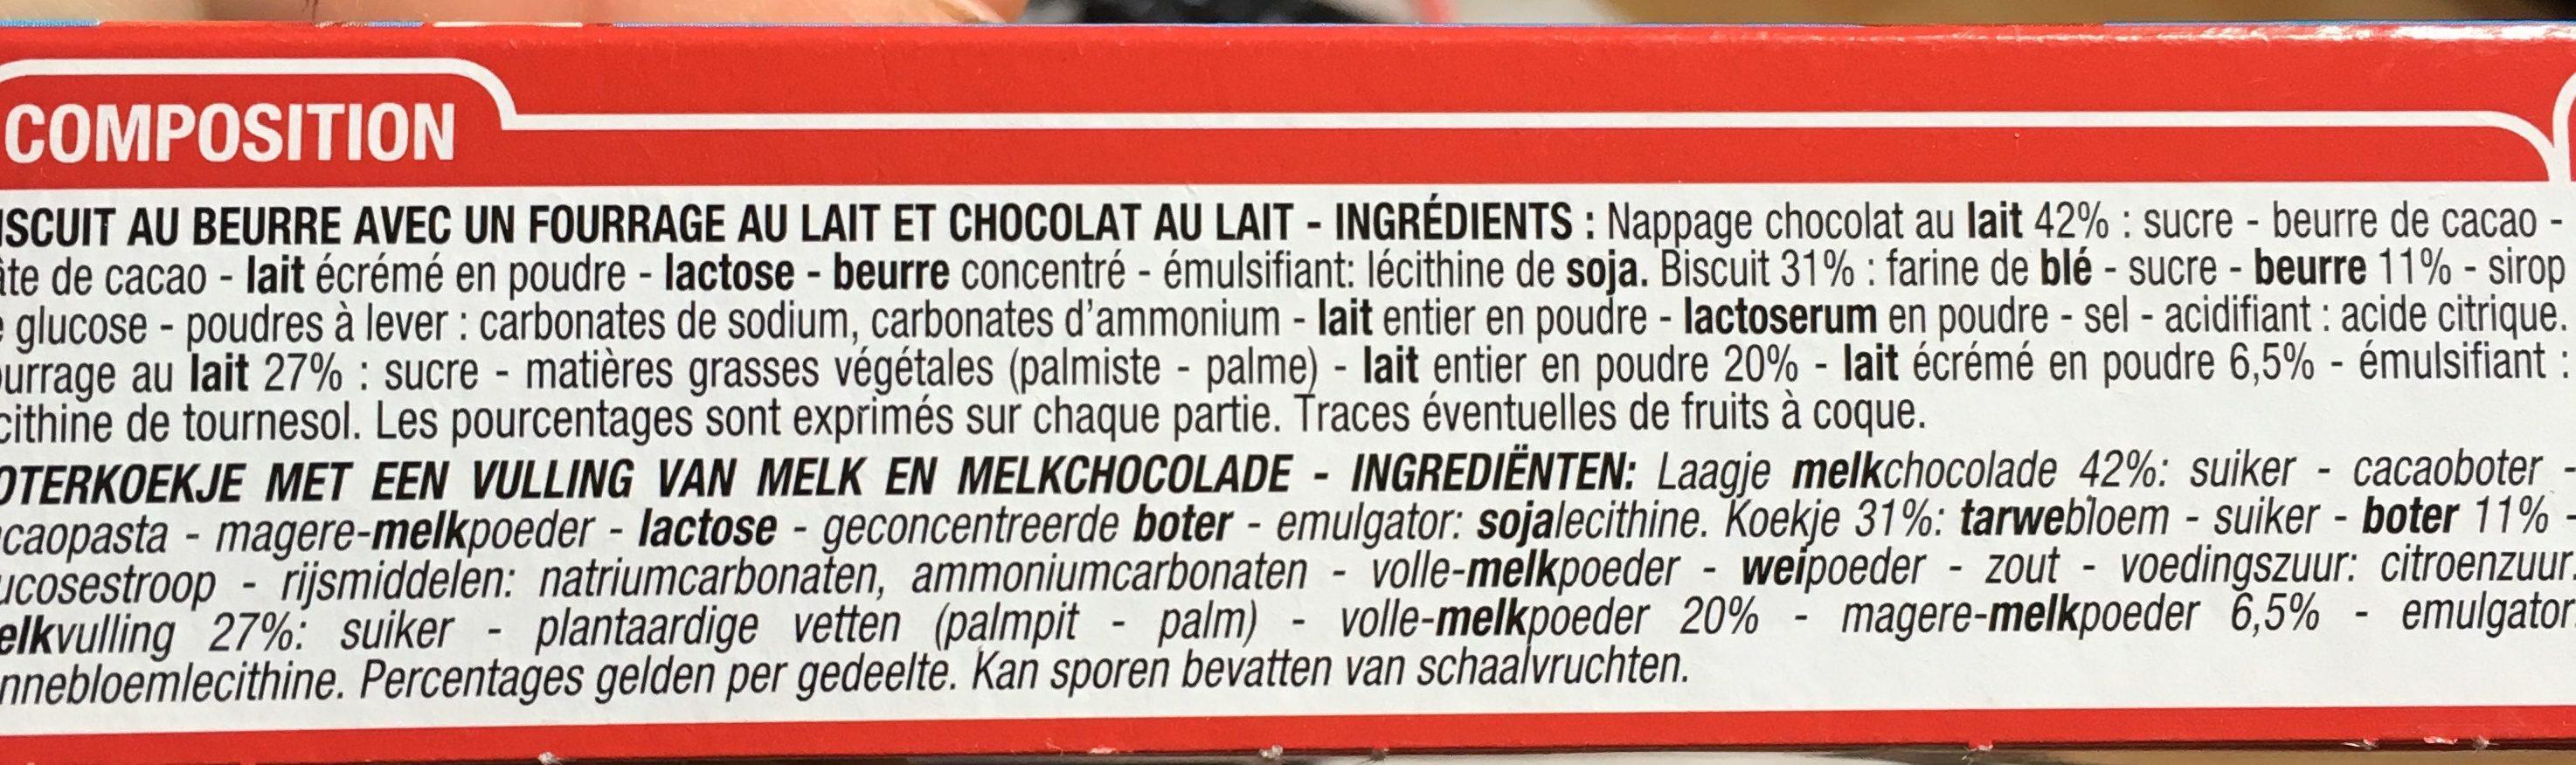 Choco & Lait - Ingredients